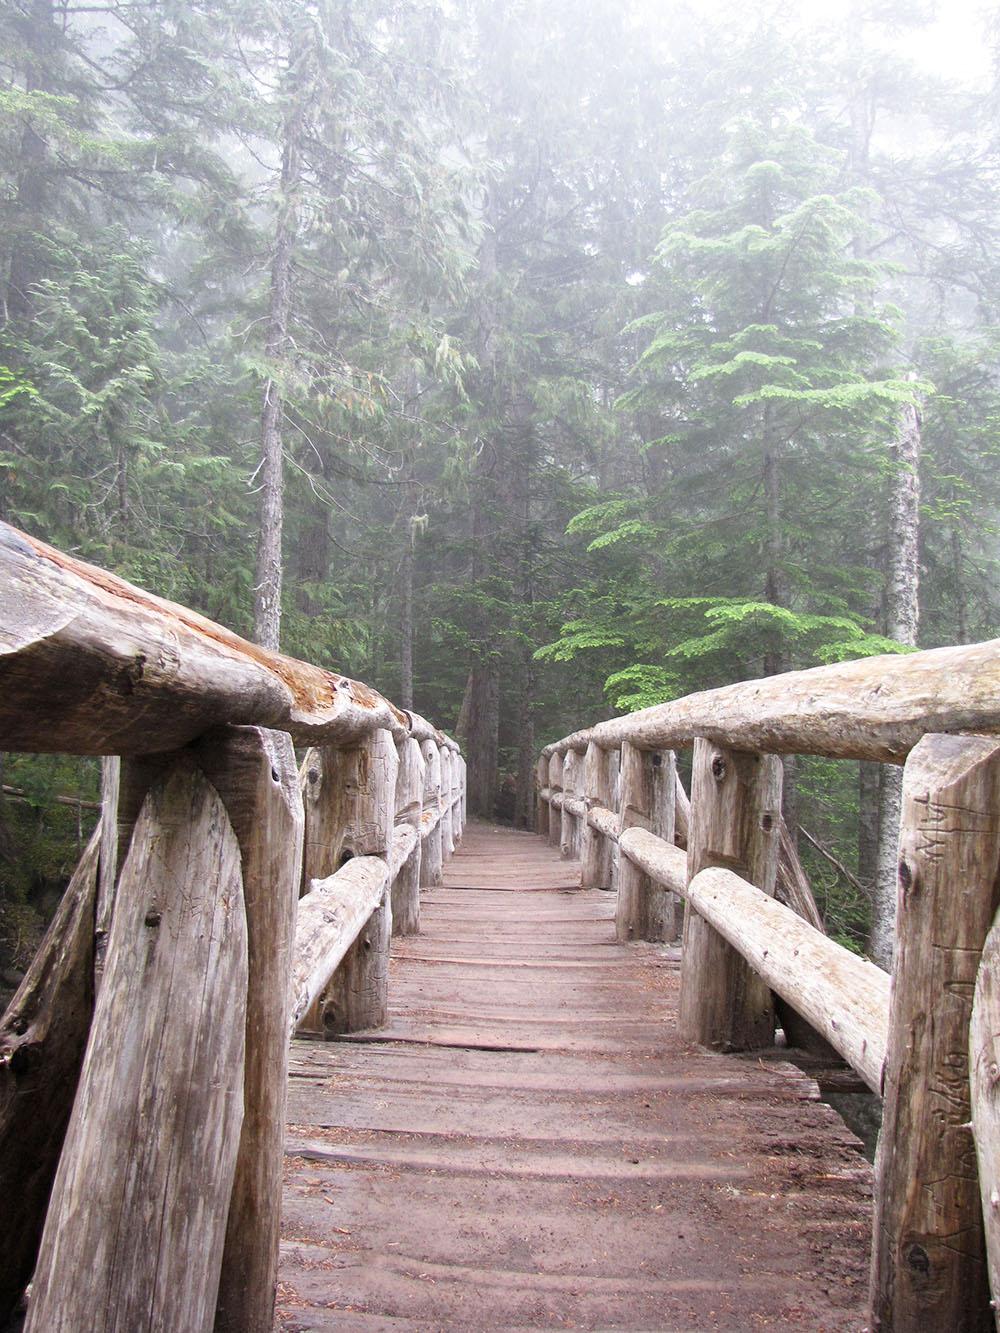 Comet Falls Trail starts with a sturdy bridge overlooking Christine Falls.